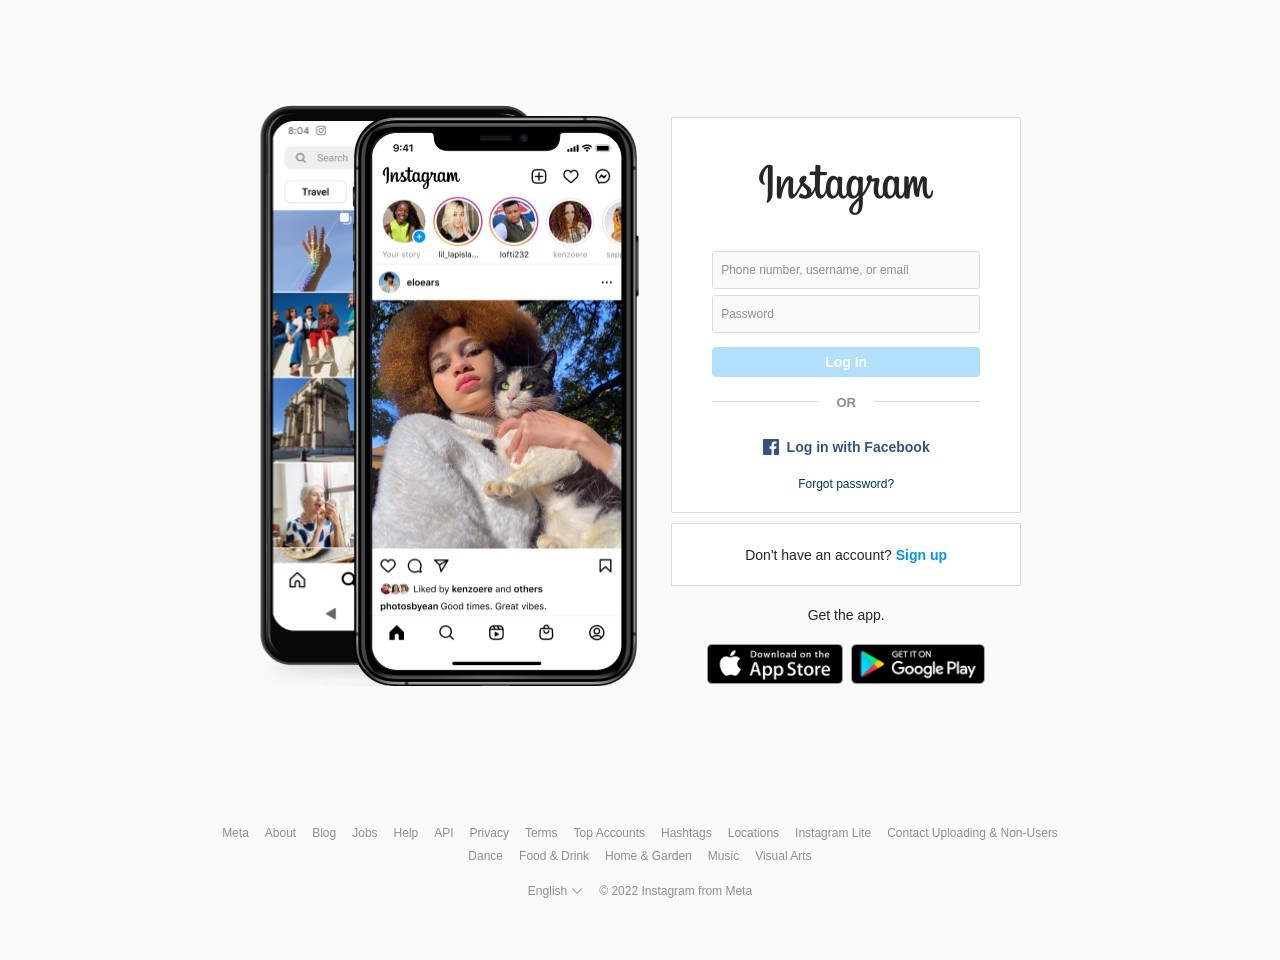 NAOTO (ダンサー)のインスタグラム(Instagram)